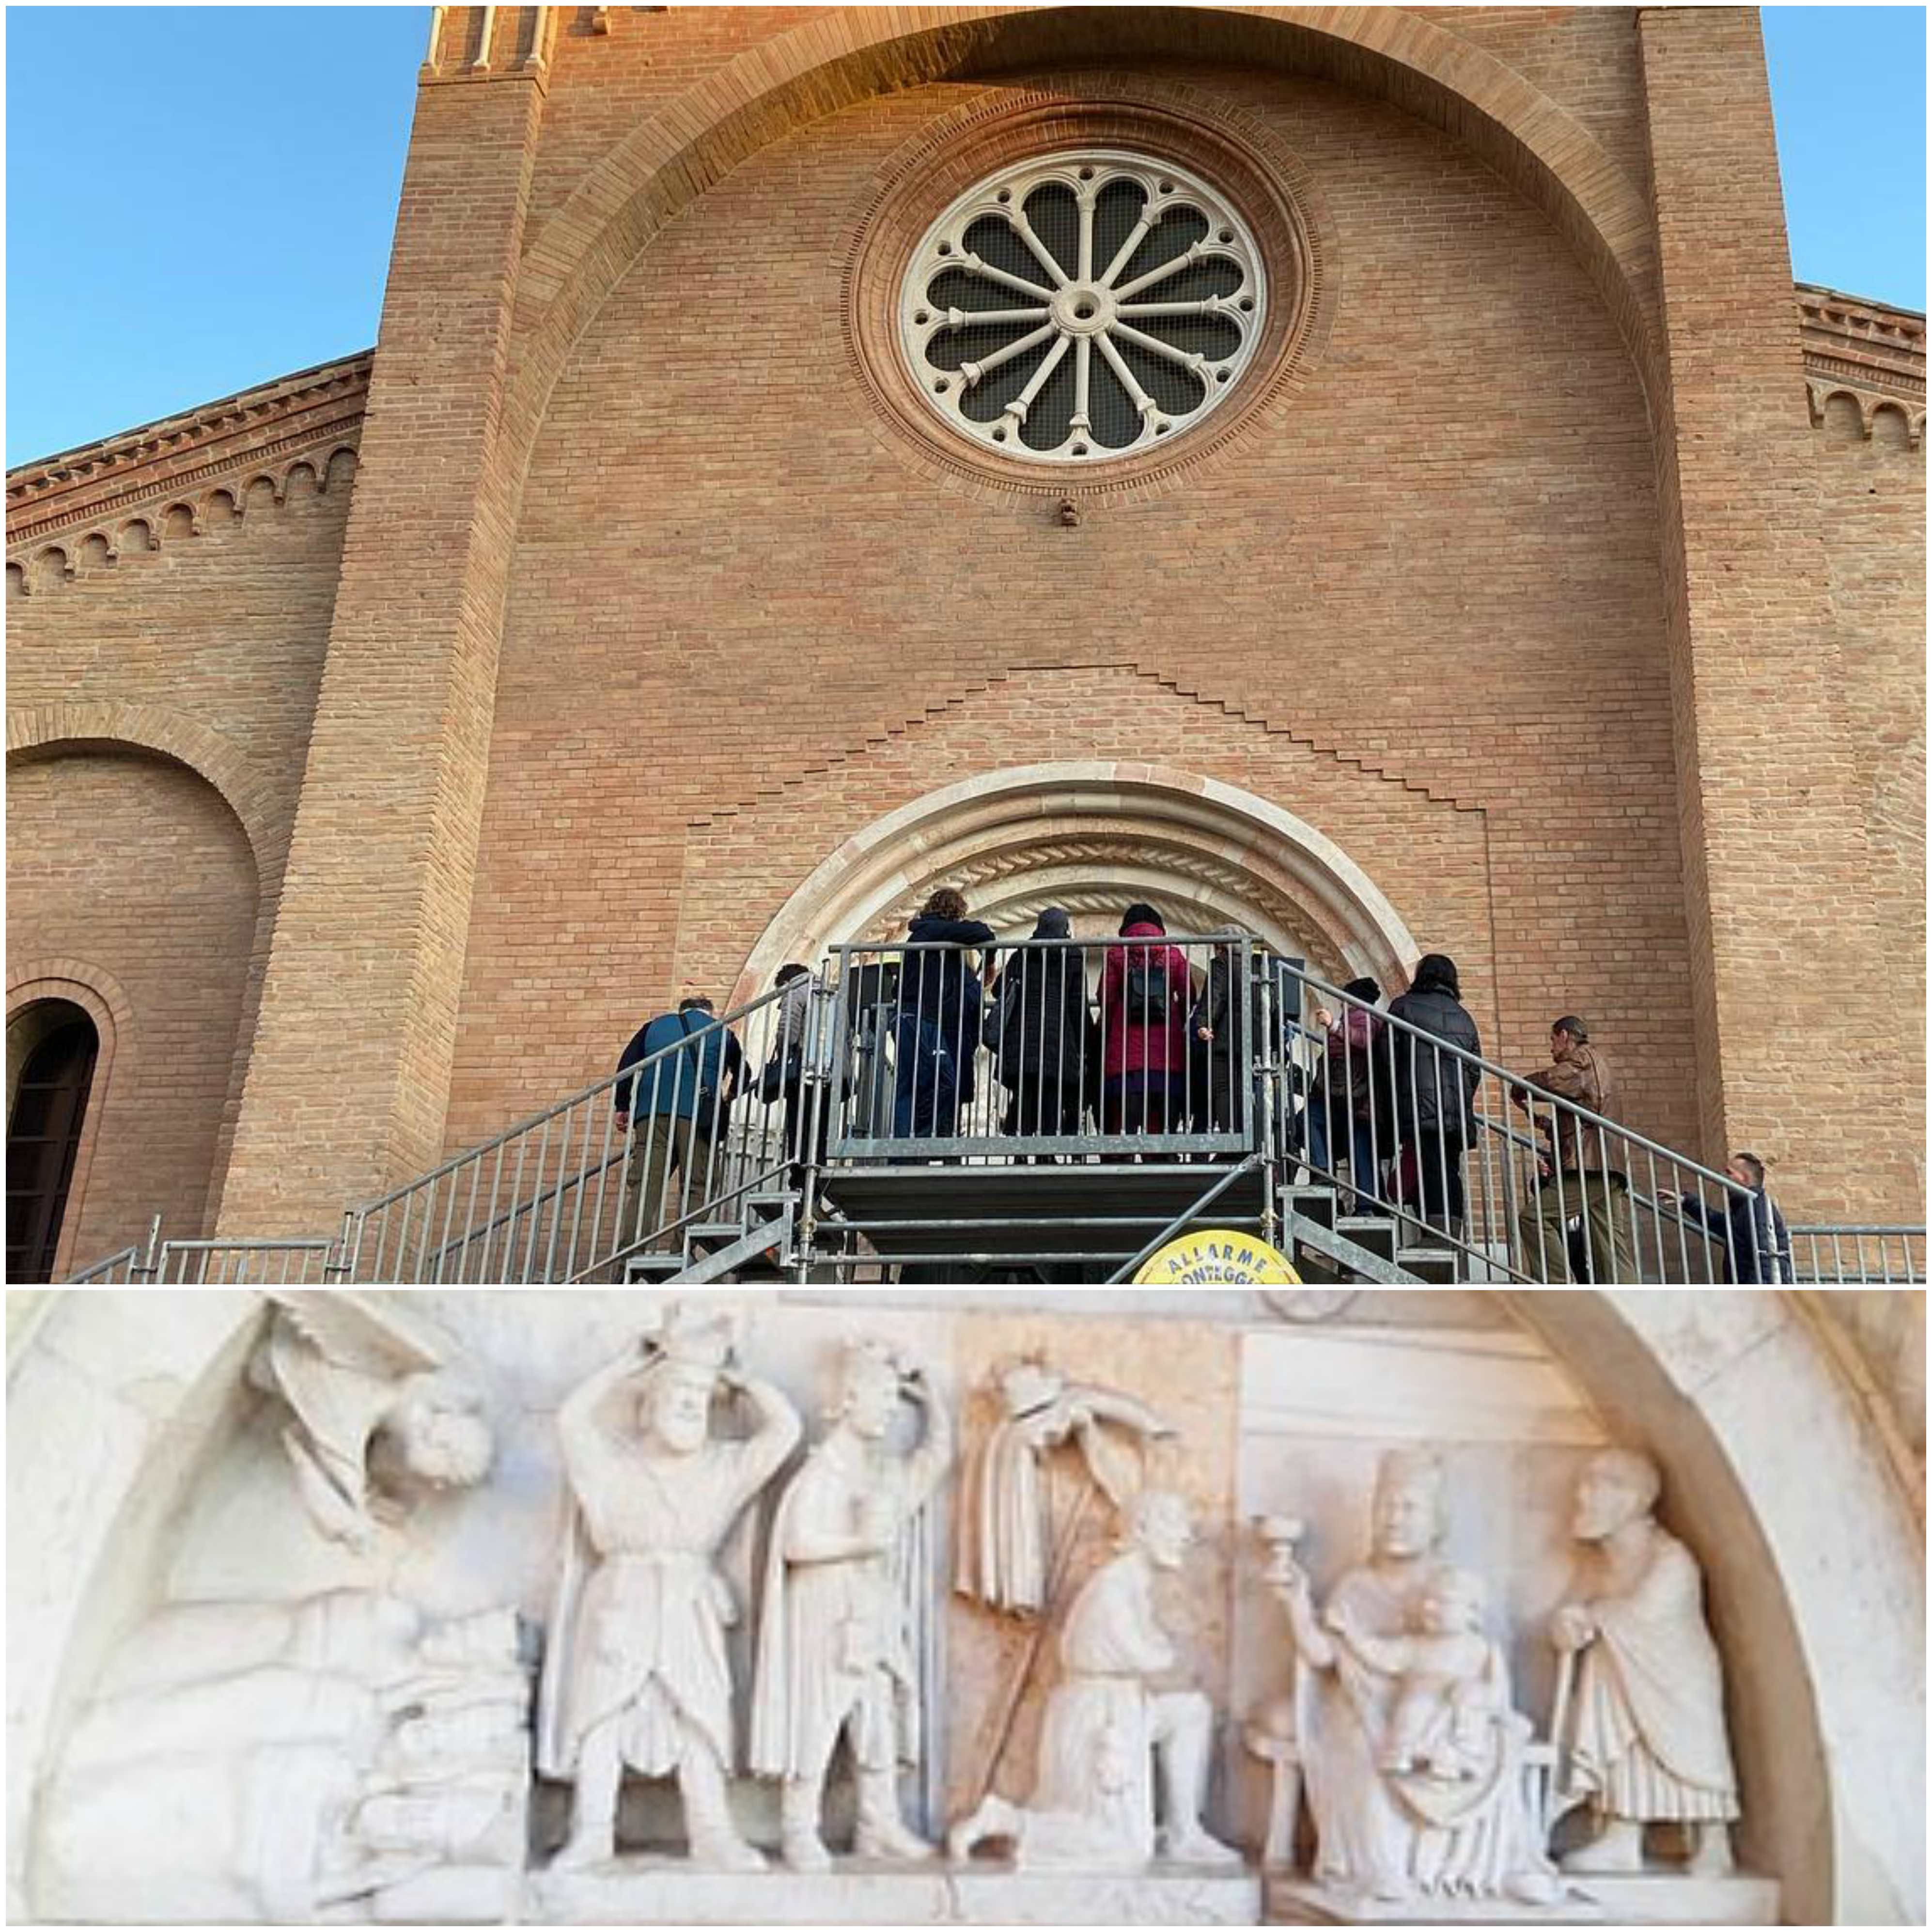 San-Mercuriale-restaurato